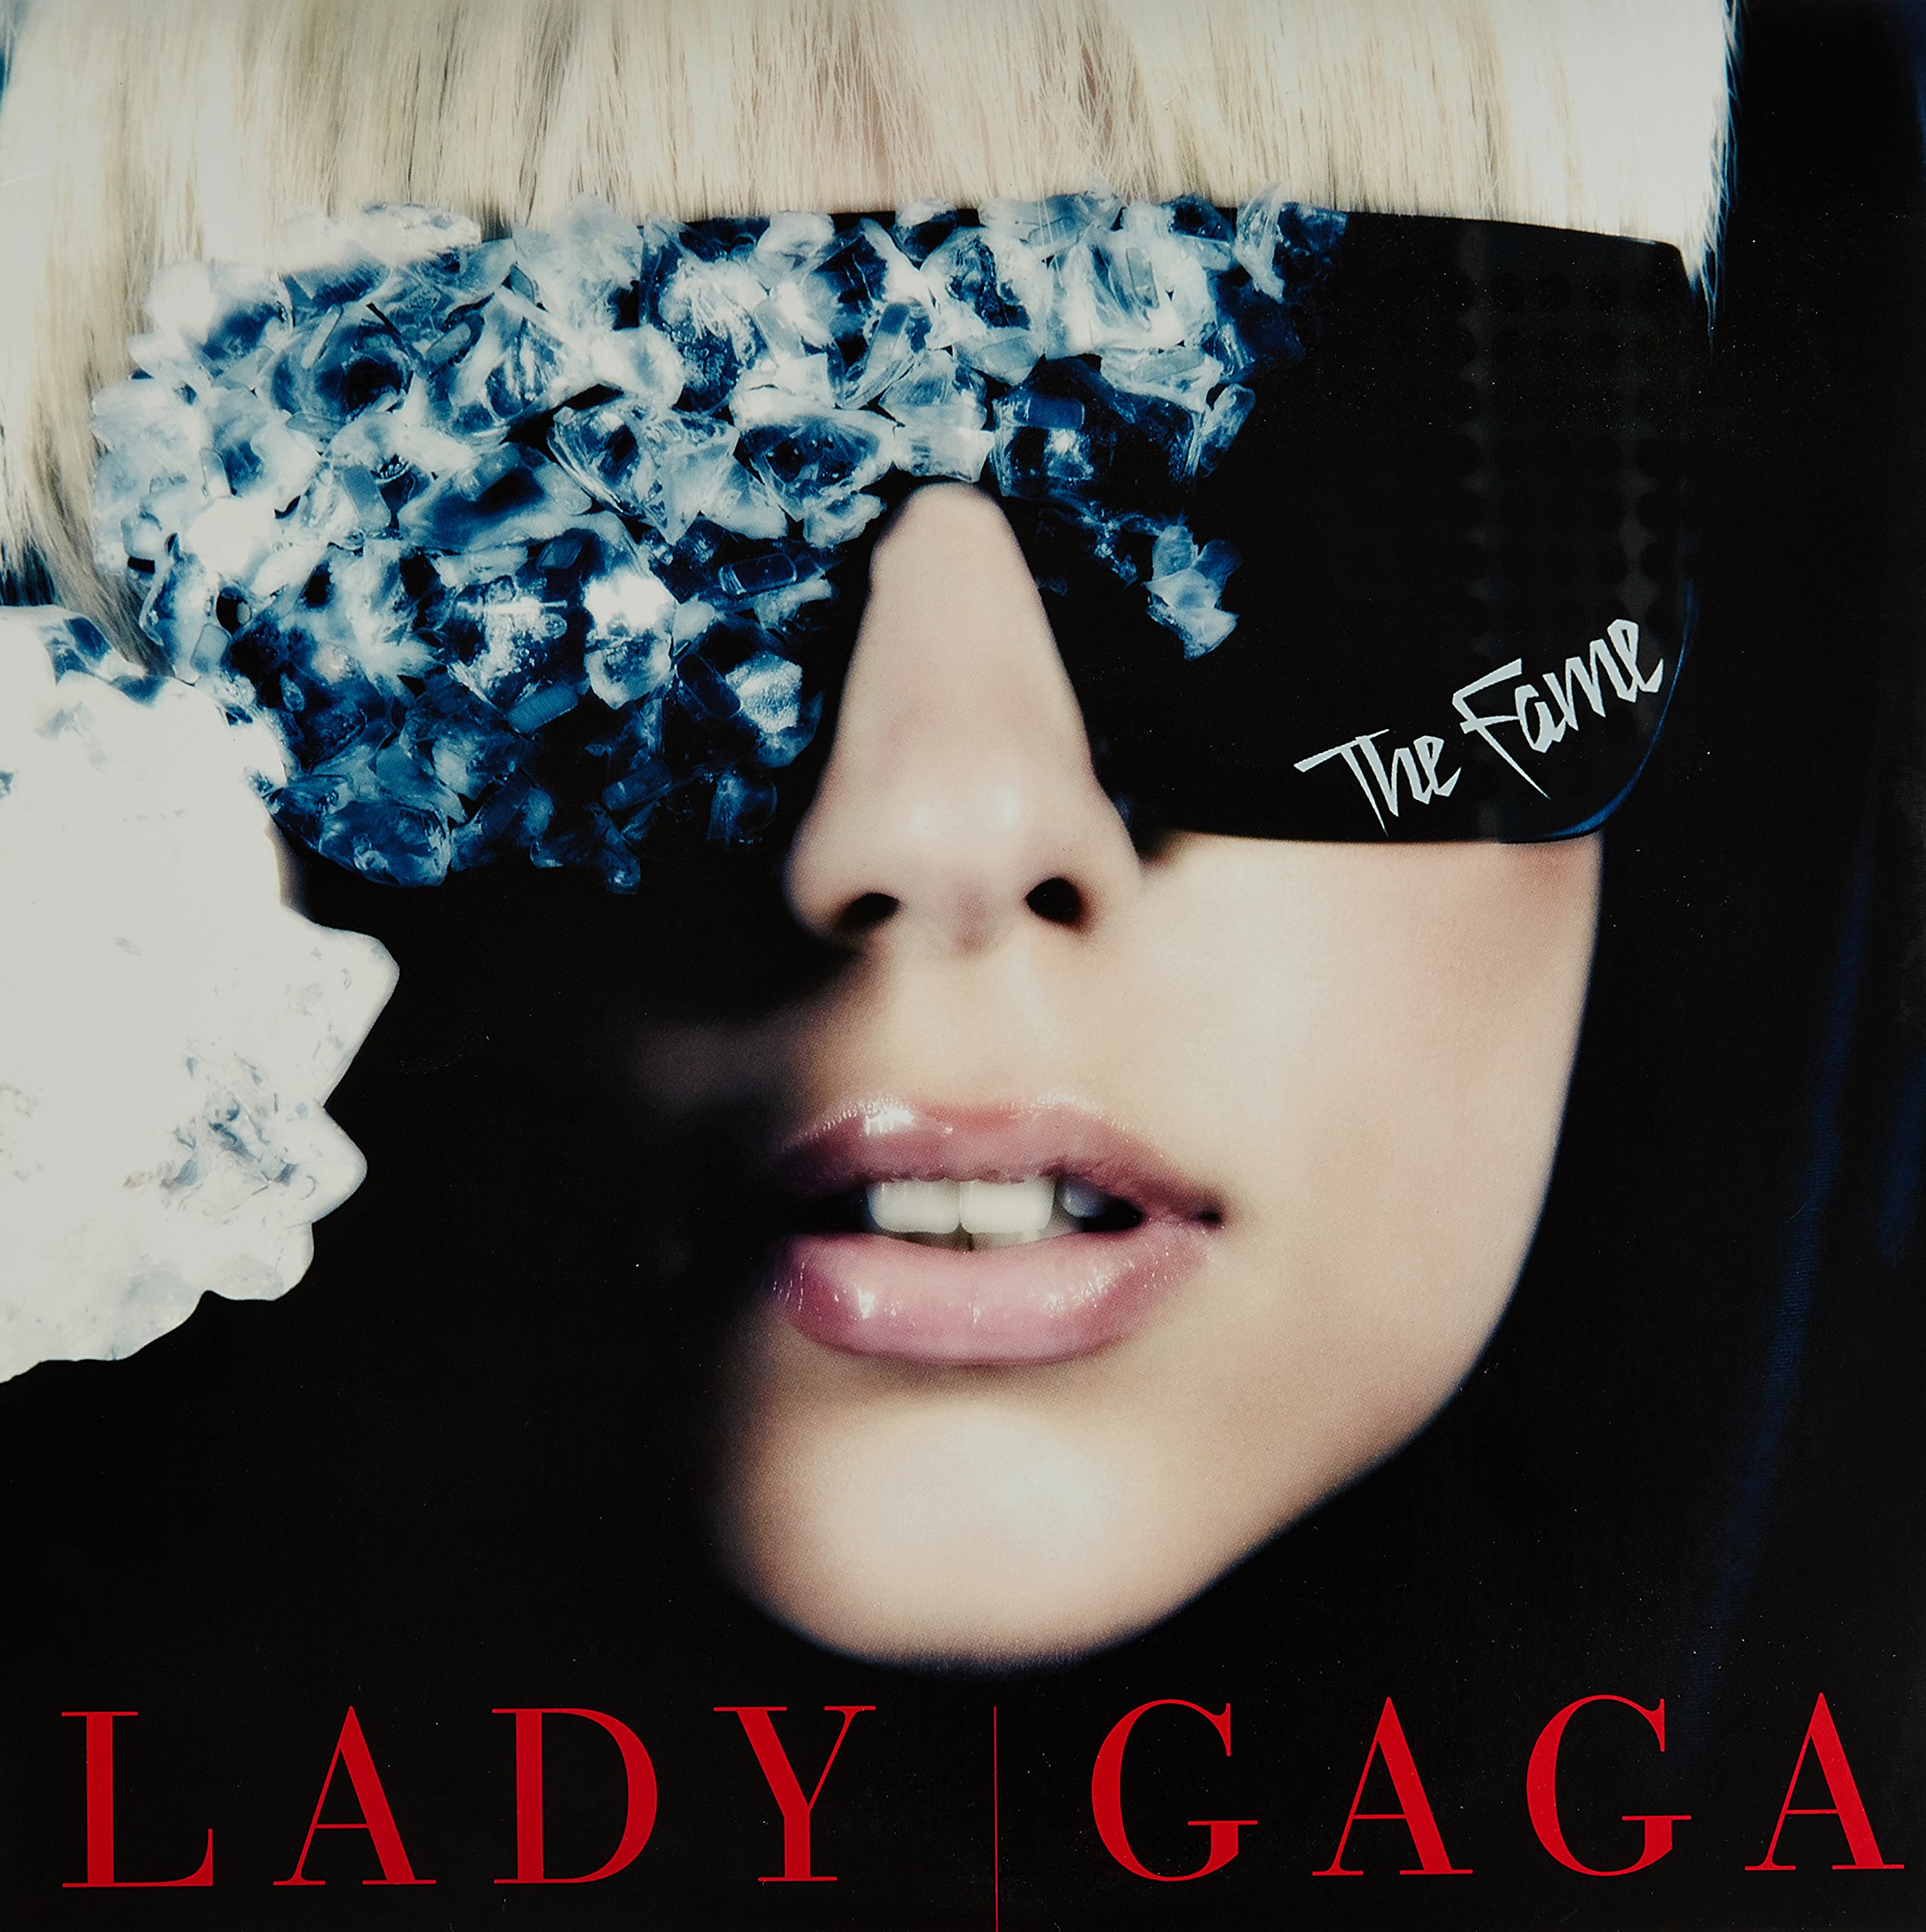 Vinilo : Lady Gaga - Fame (2 Disc)